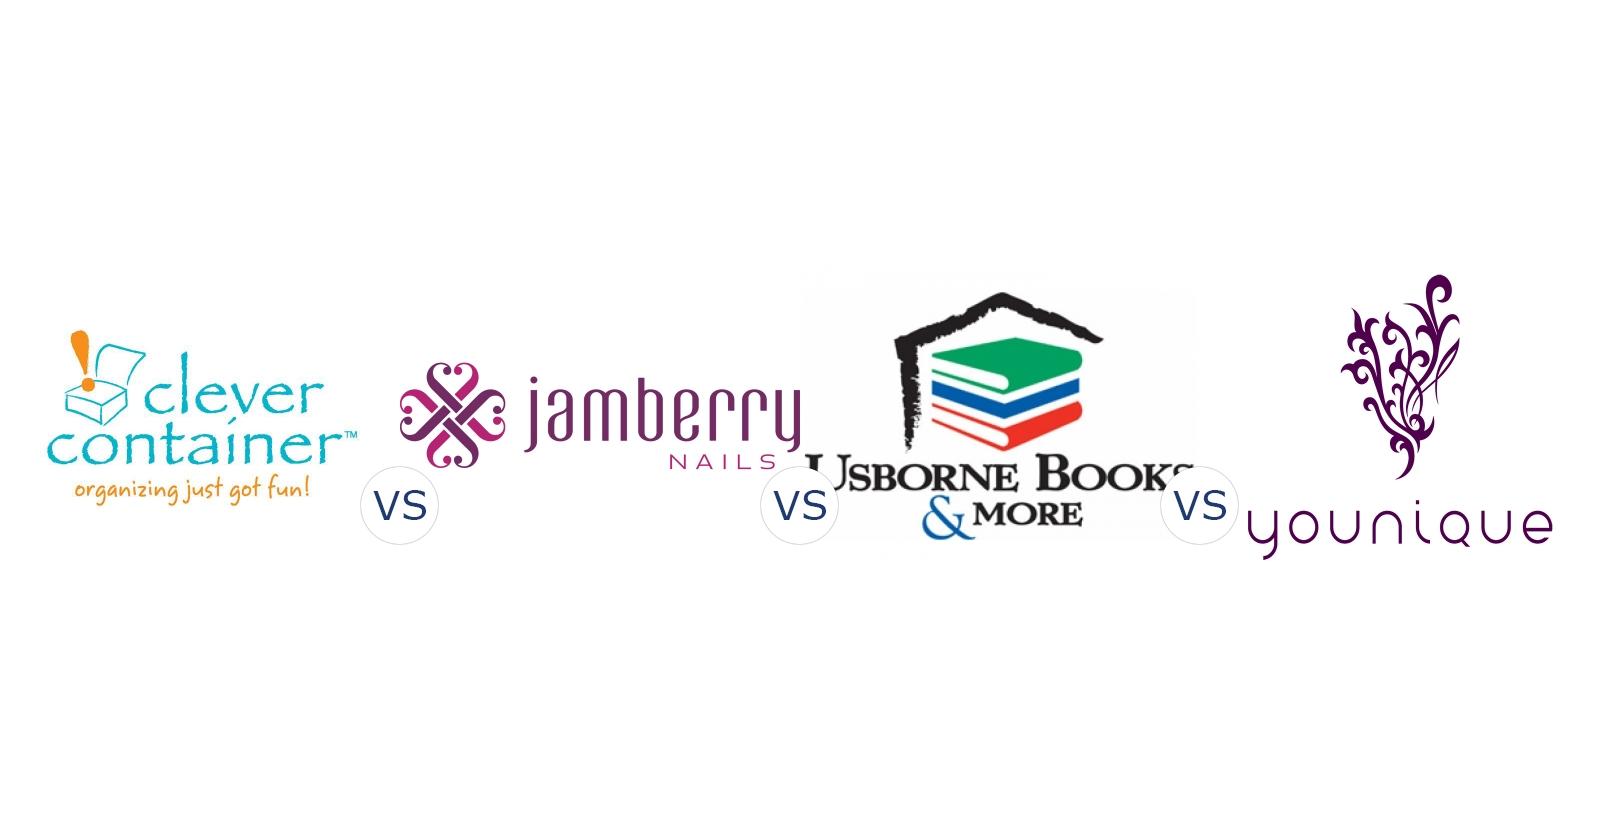 Clever Container vs. Jamberry Nails vs. Usborne Books vs. Younique